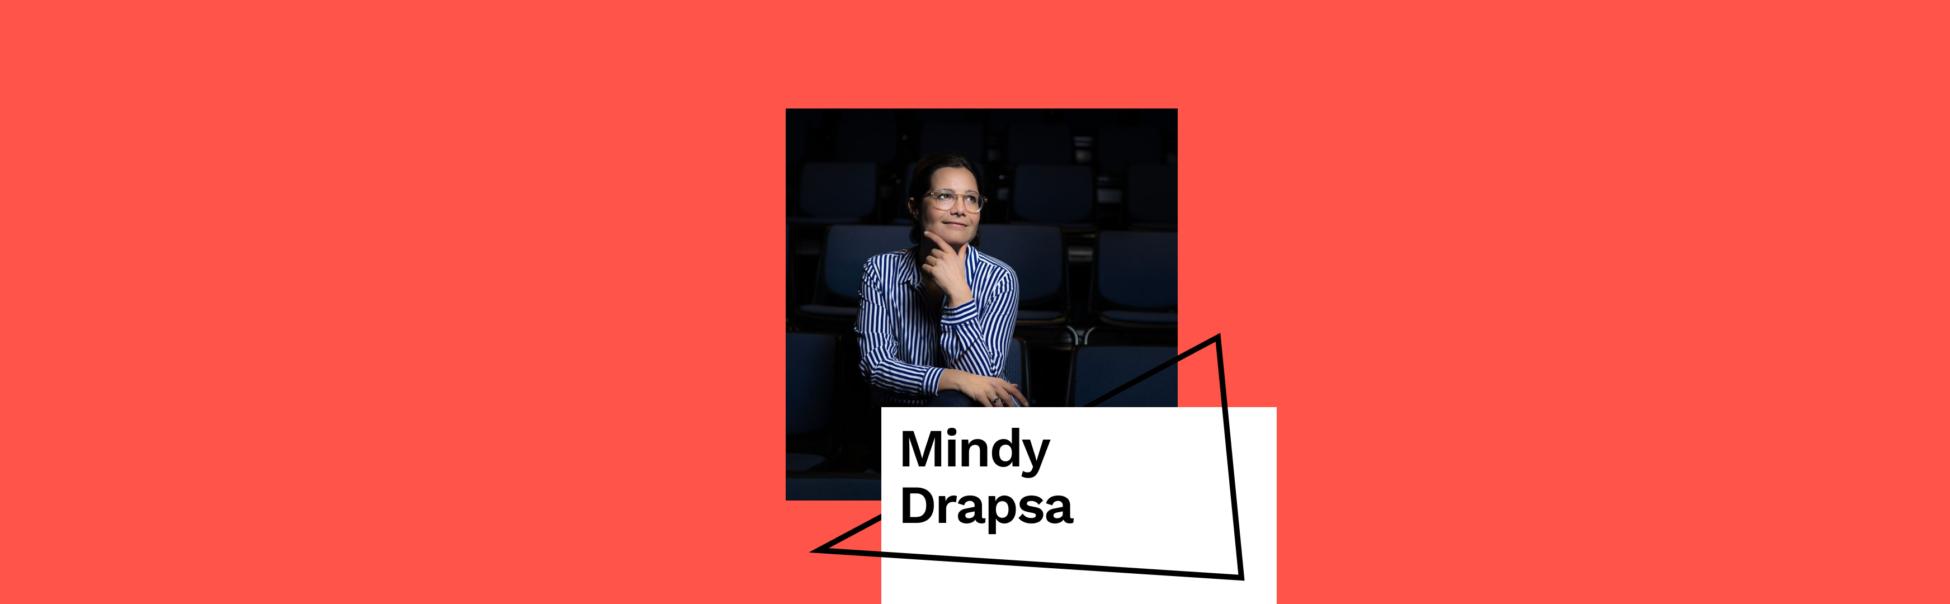 Mindy Drapsa